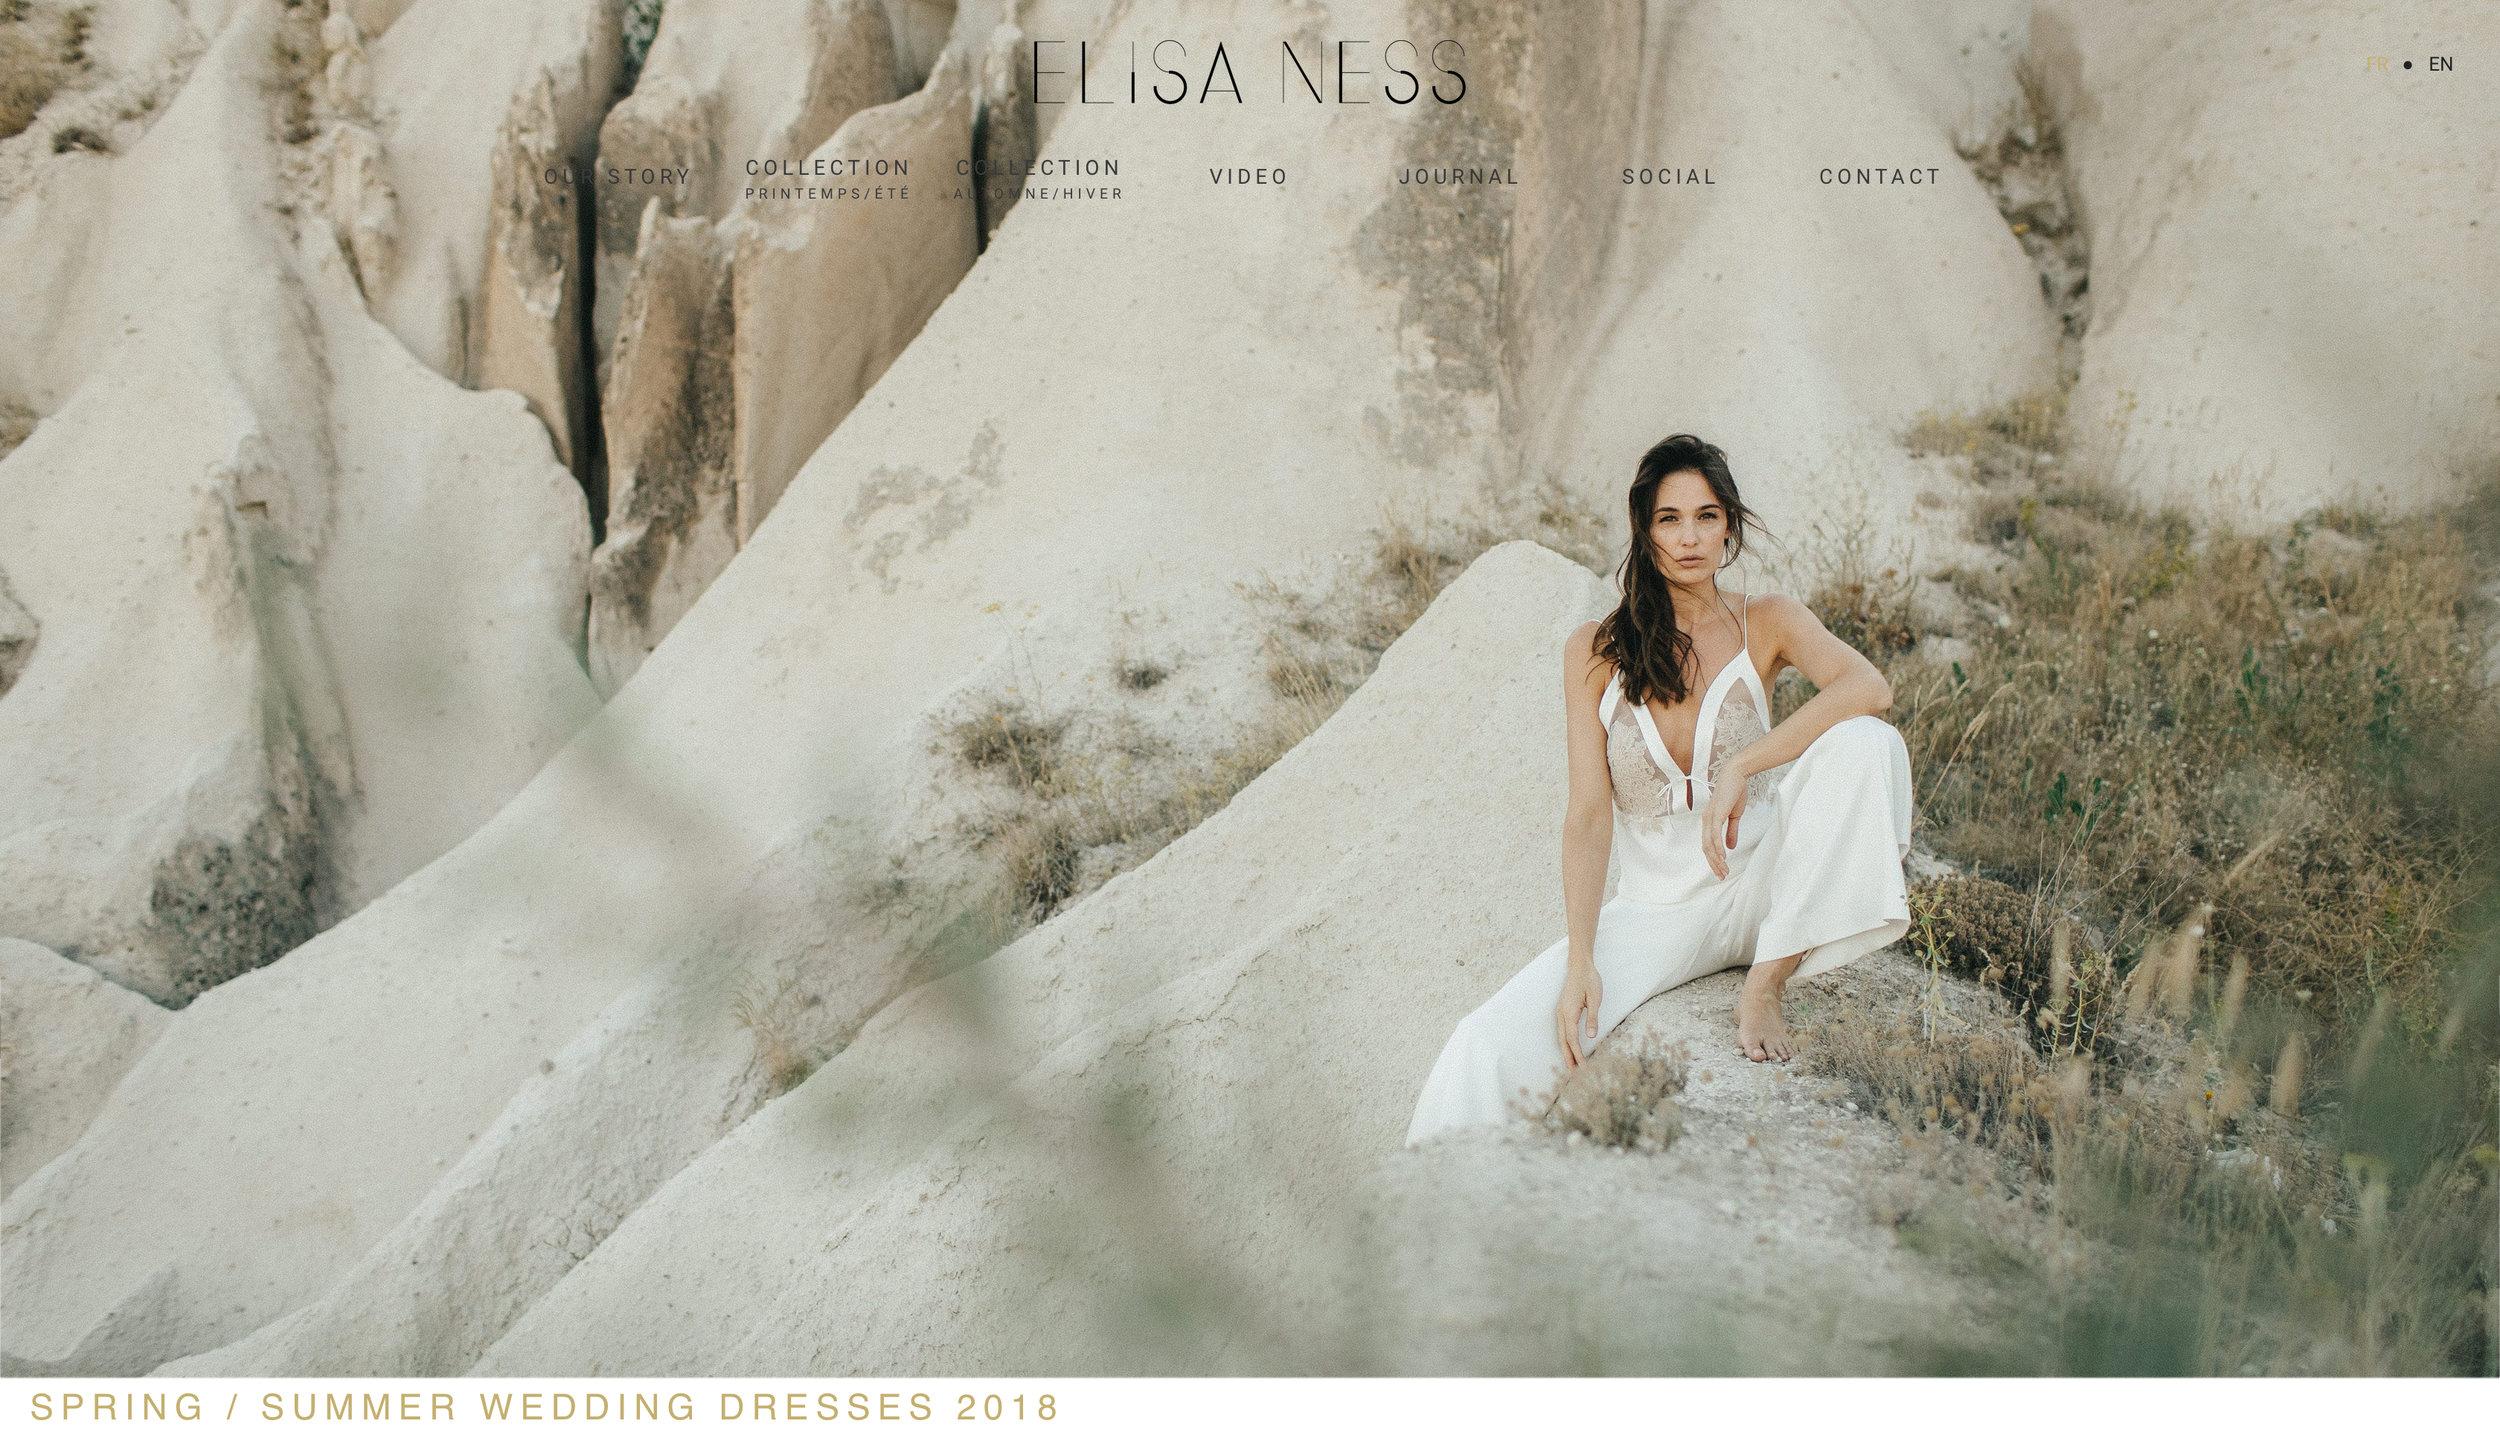 ELISANESS1.jpg